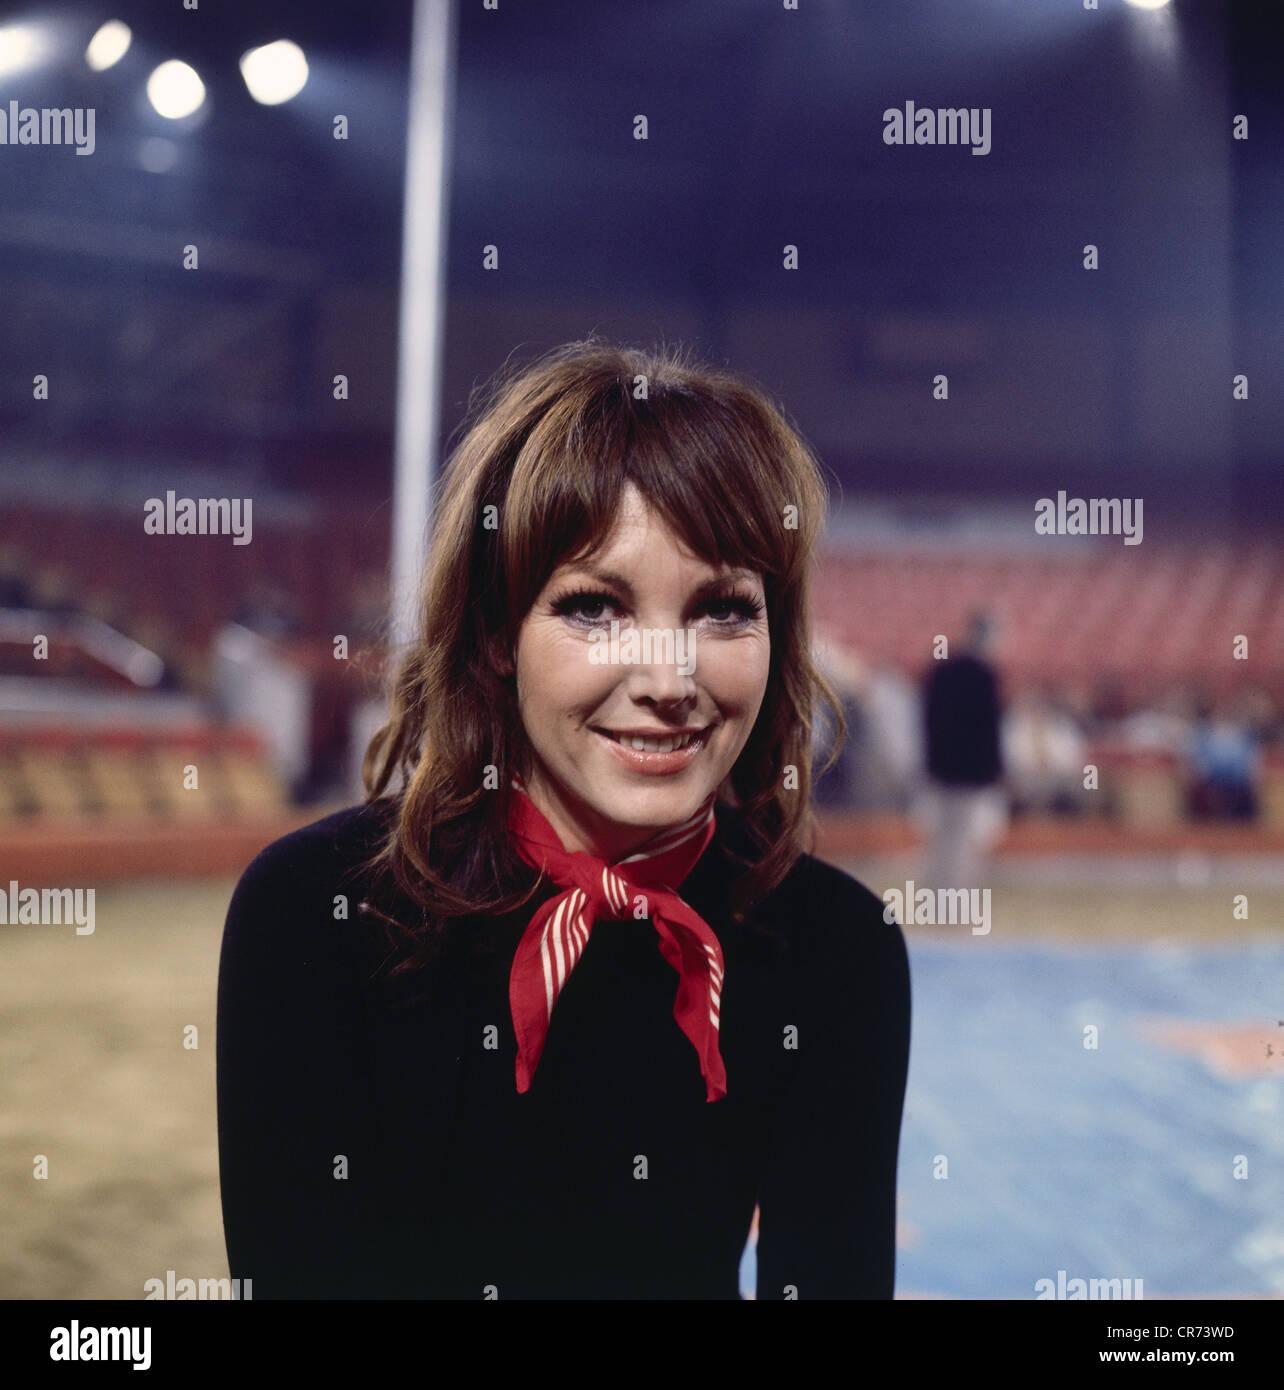 Schuermann, Petra, 15.9.1935 - 13.1.2010, German actress, TV presenter, portrait, 2.1.1972, Additional-Rights-Clearances - Stock Image